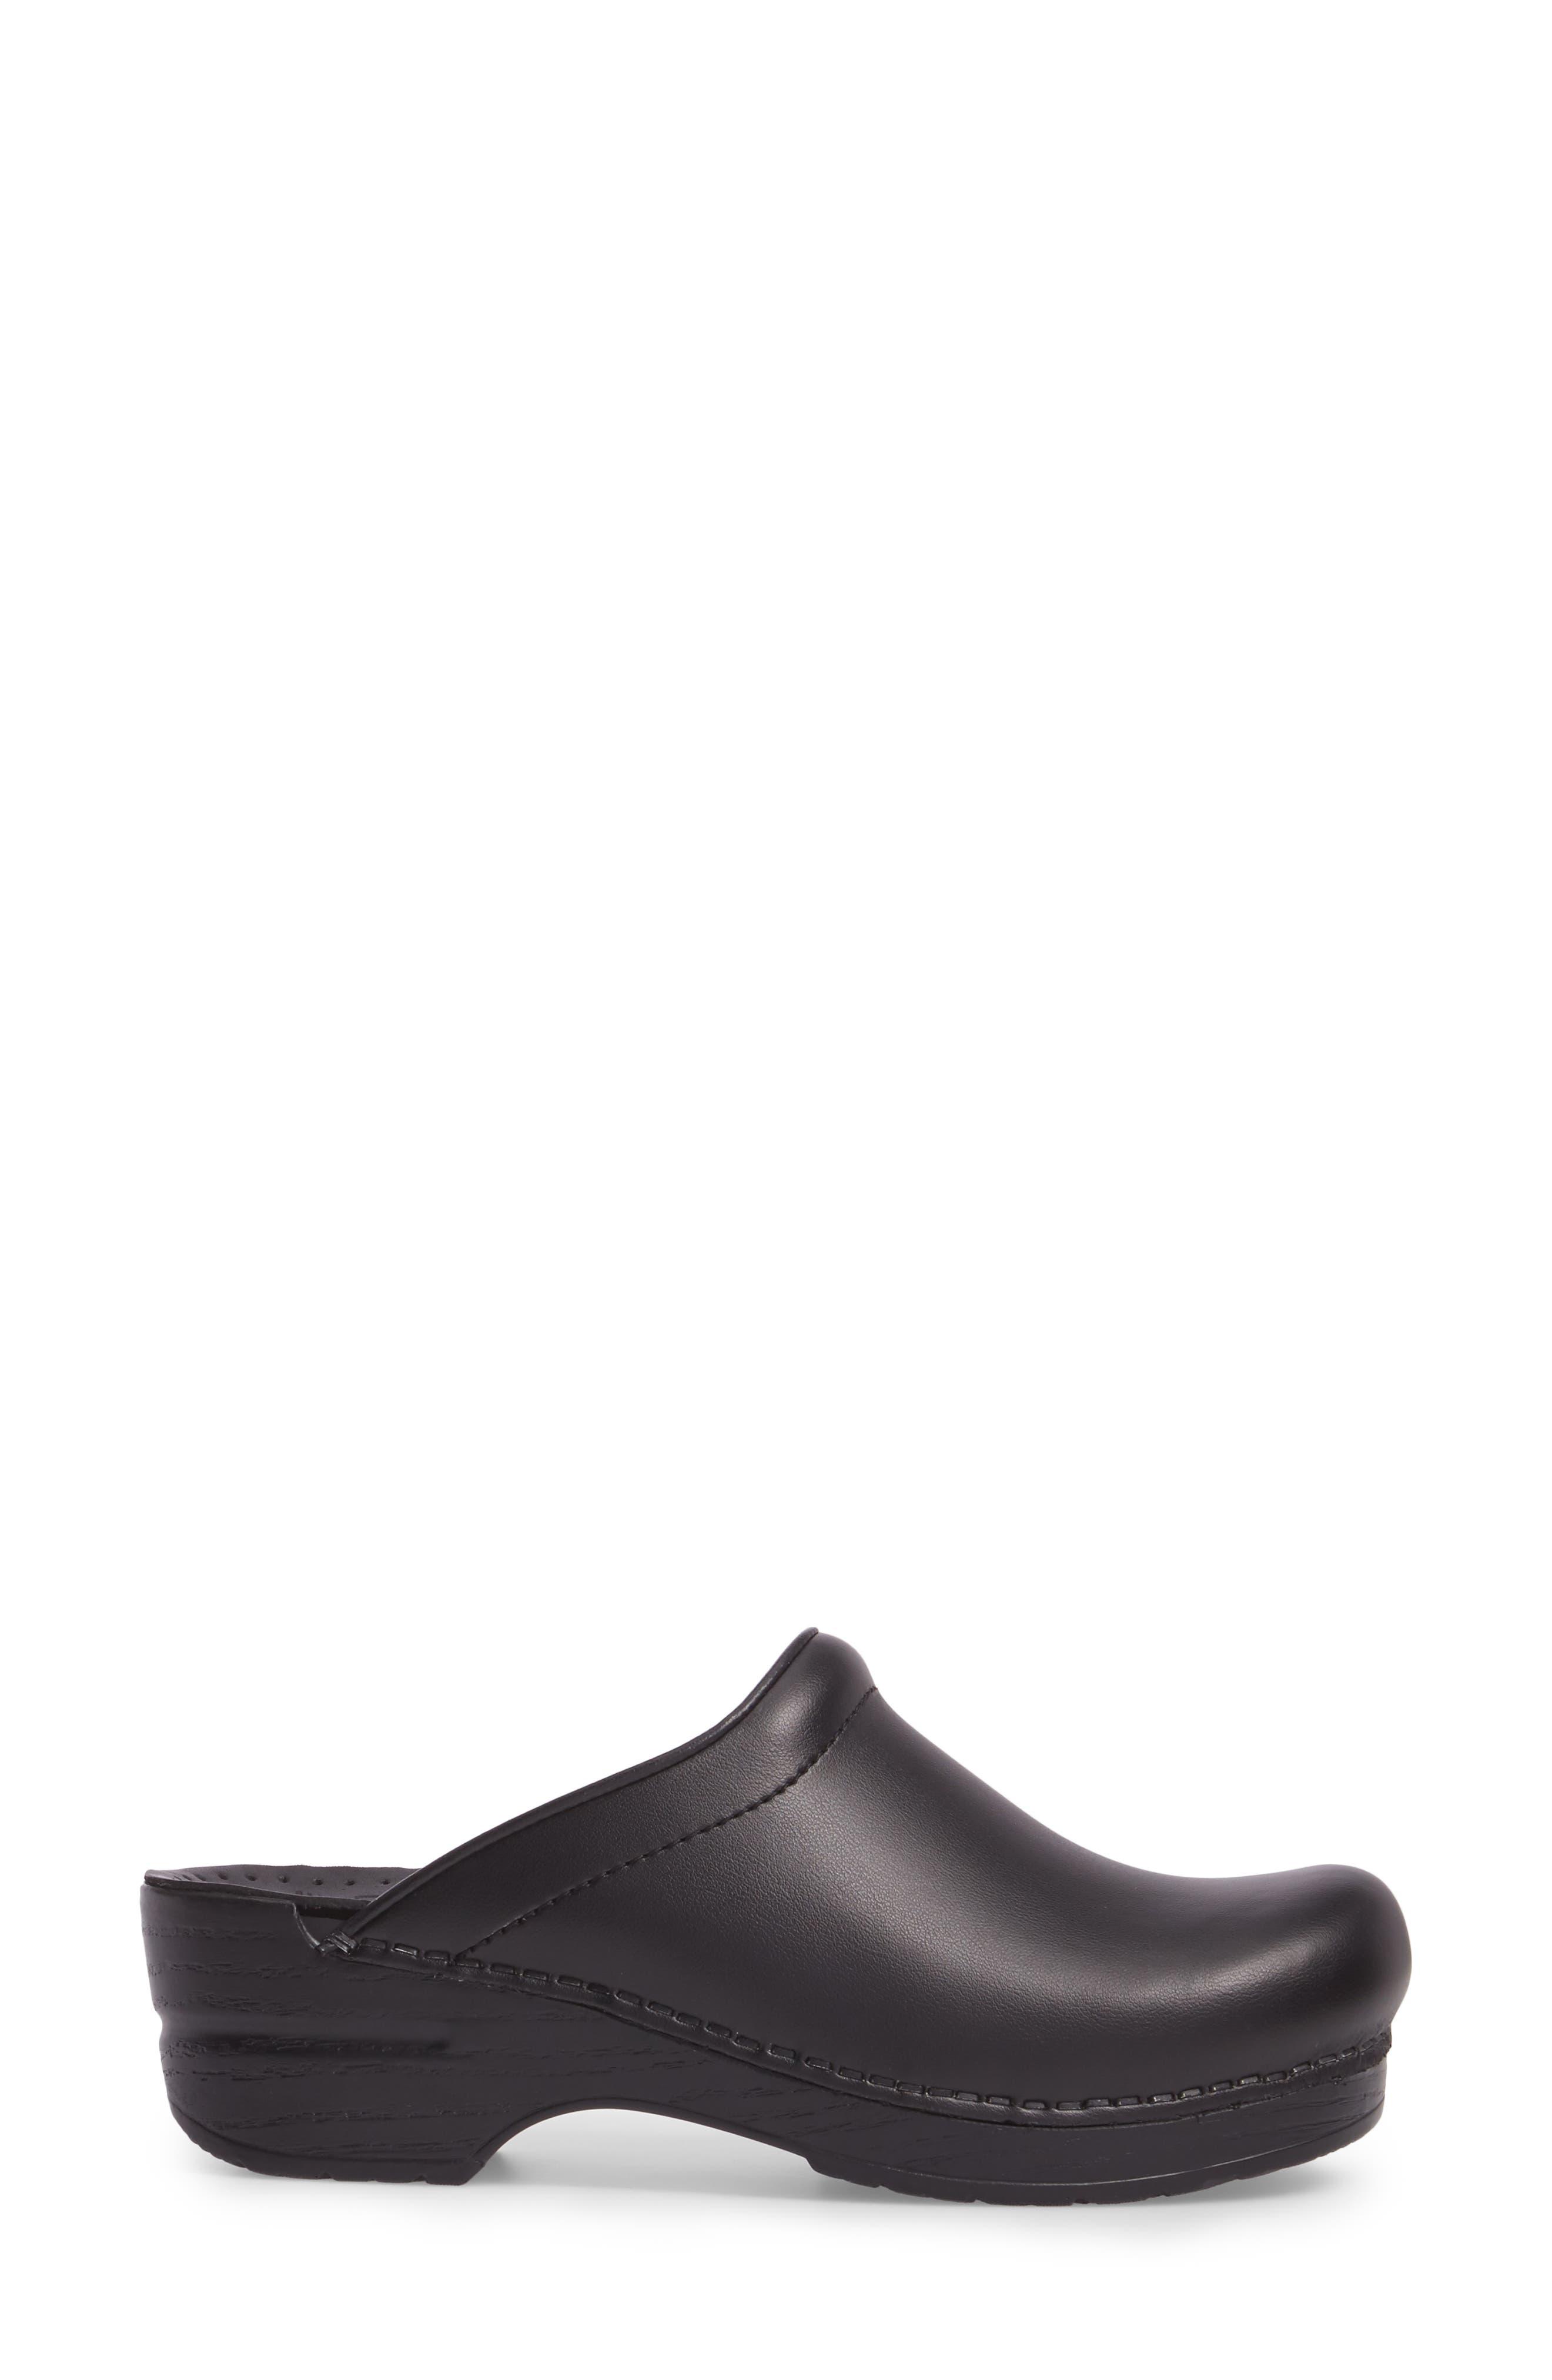 Alternate Image 3  - Dansko 'Sonja' Patent Leather Clog